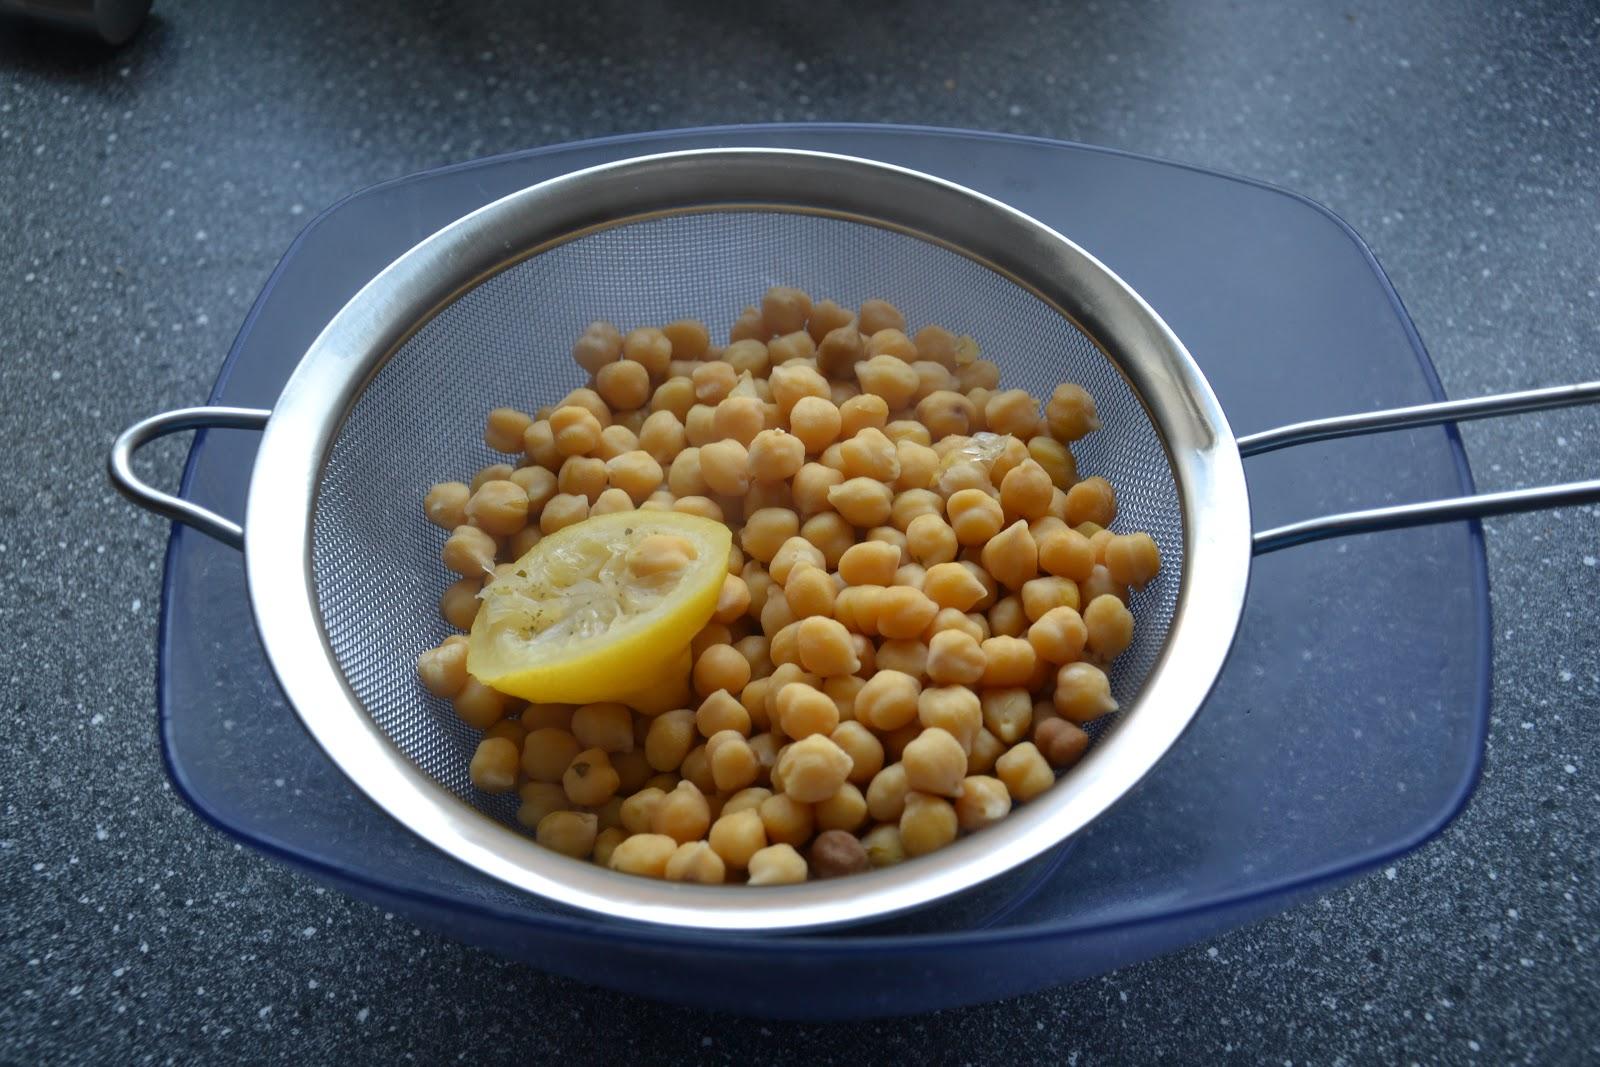 hvor kommer humus fra